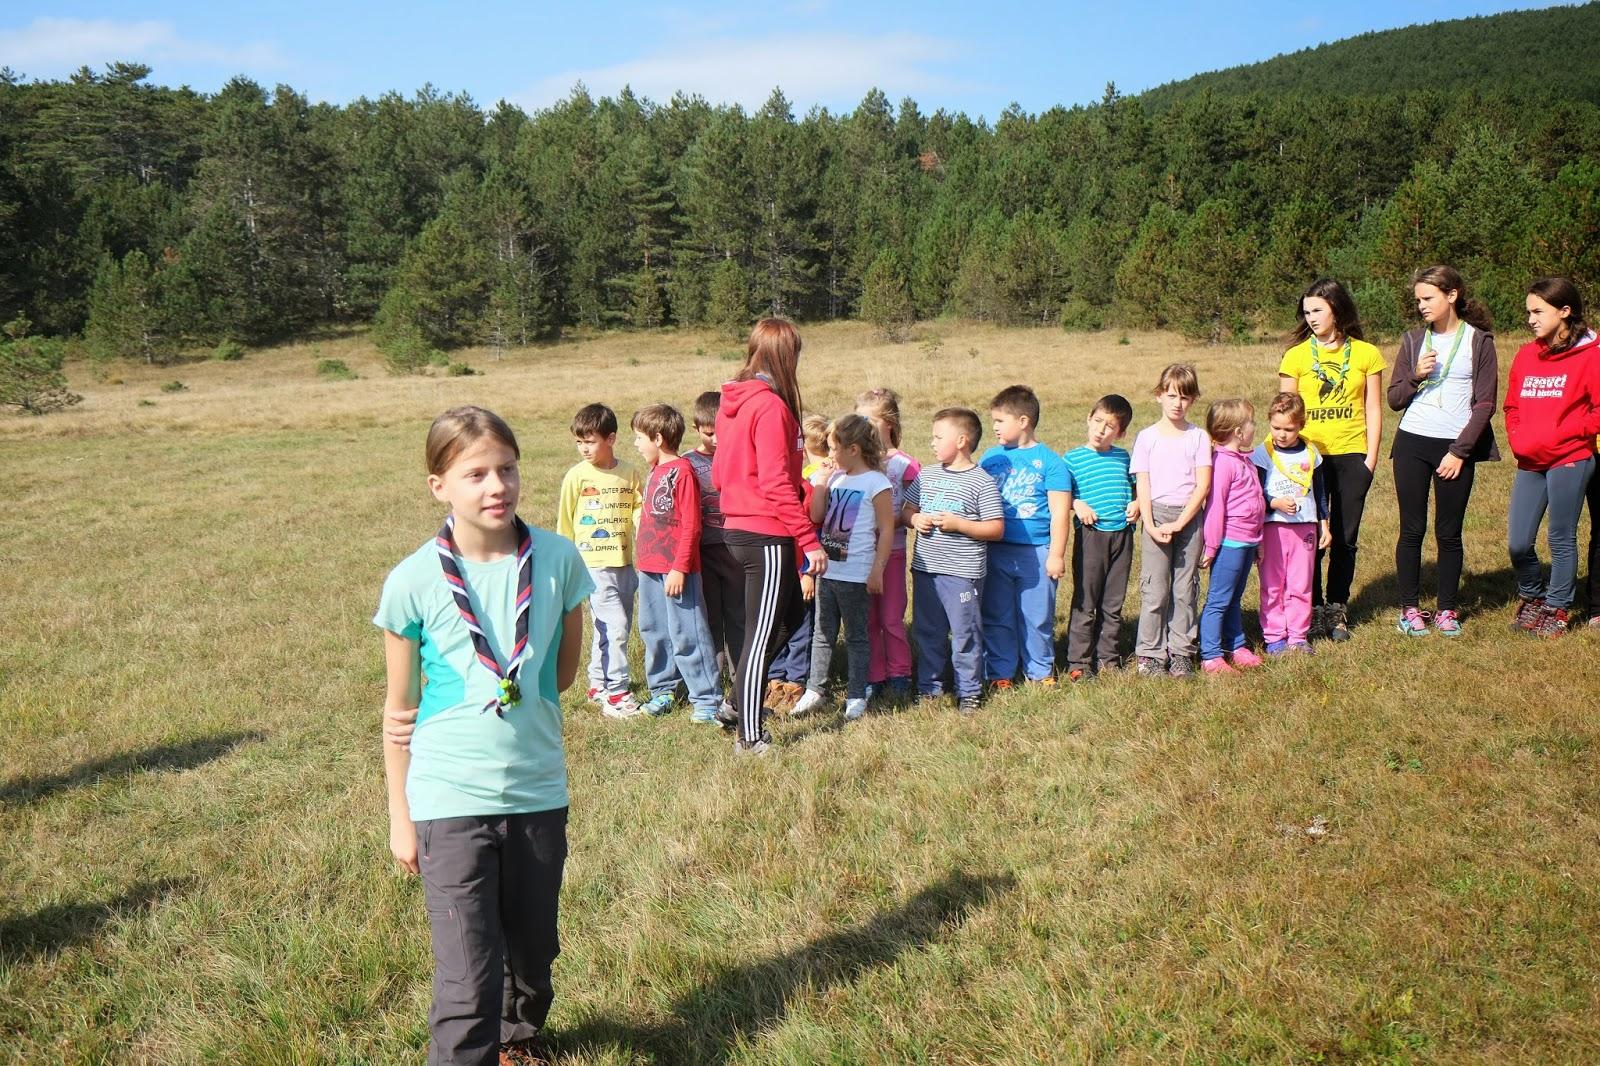 Pohod na Kozlek, Kozlek, 11.10.2014 - DSCF1249.JPG